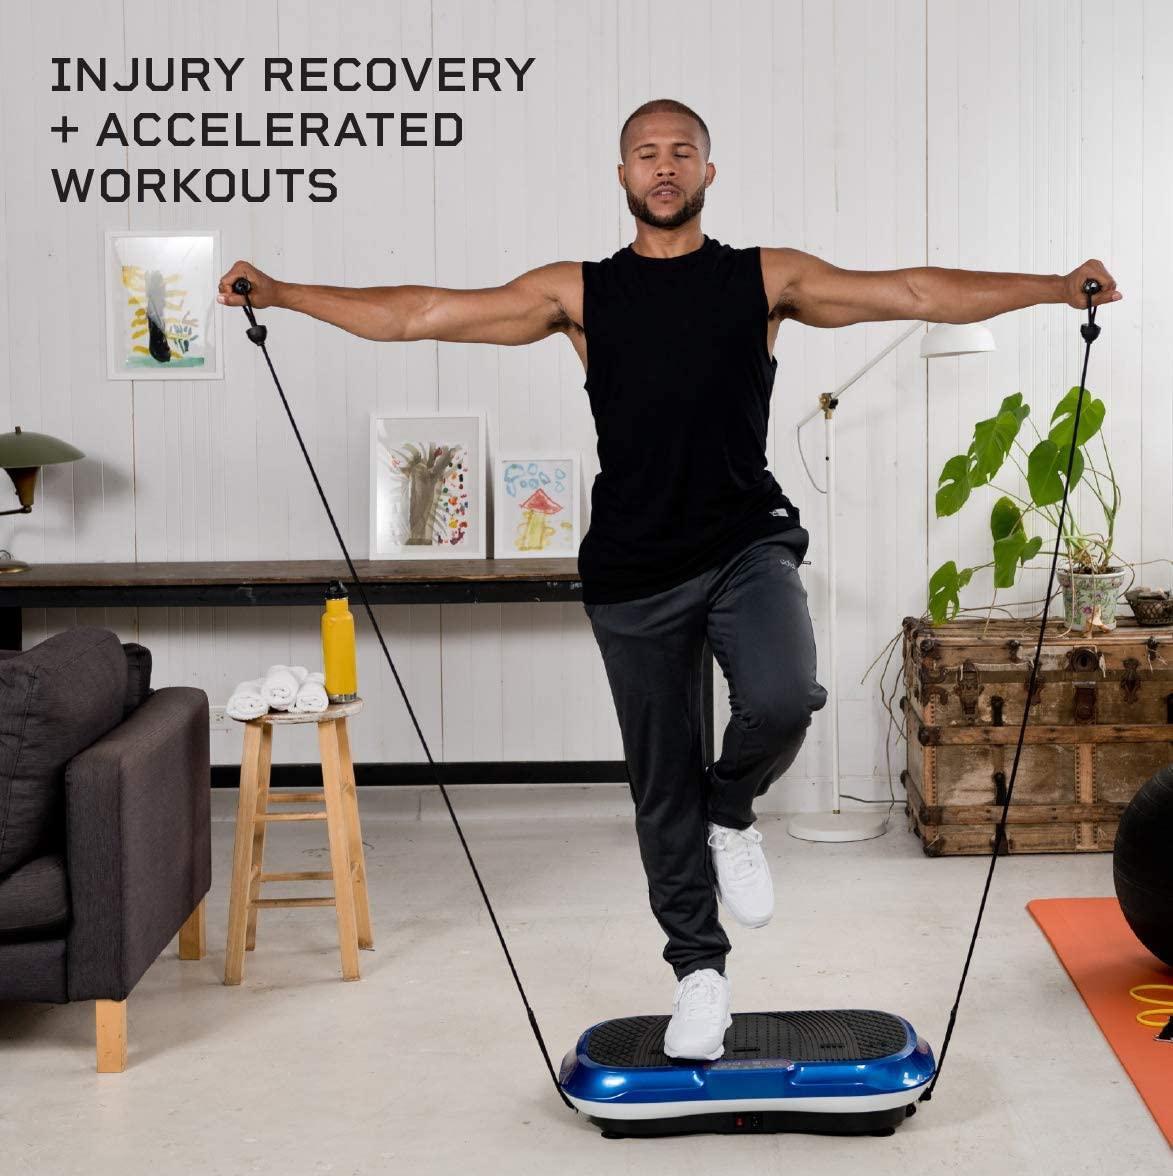 LifePro Vibration Plate Exercise Machine Whole Body Workout Vibration Fitness Platform w/Loop Bands - Home Training Equipment - Remote, Balance Straps